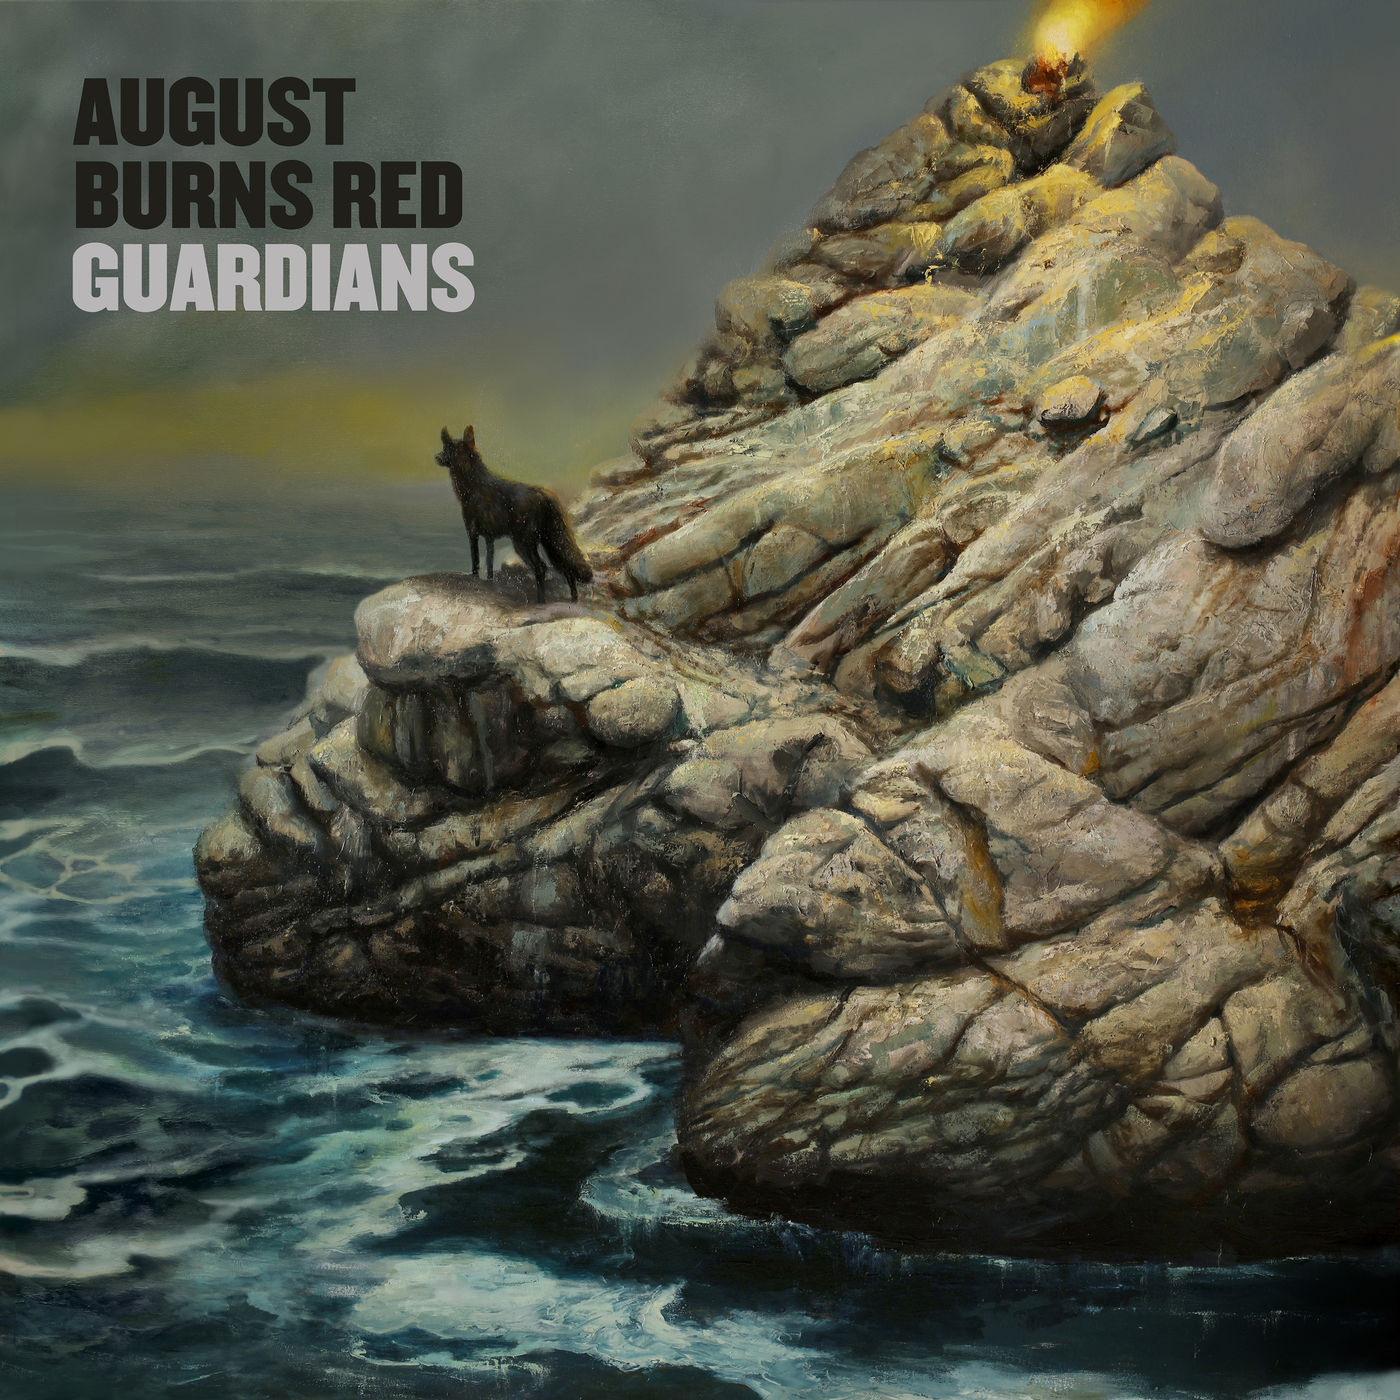 August Burns Red - Bones [single] (2020)